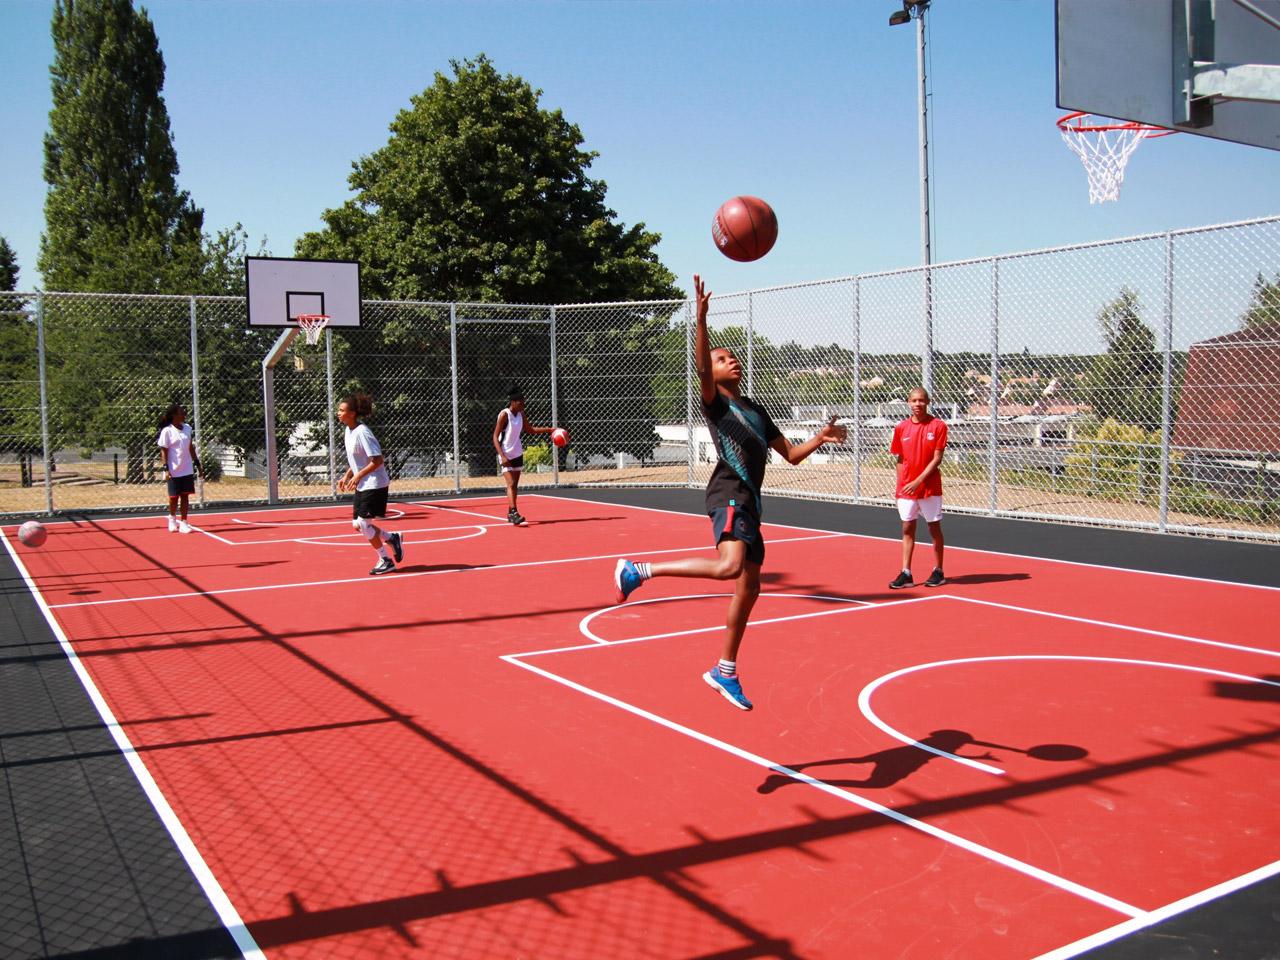 Saint Germain en Laye 78 - Terrain Playground Basket - avec resine sur enrobe - structure multisport New York entierement galvanisee